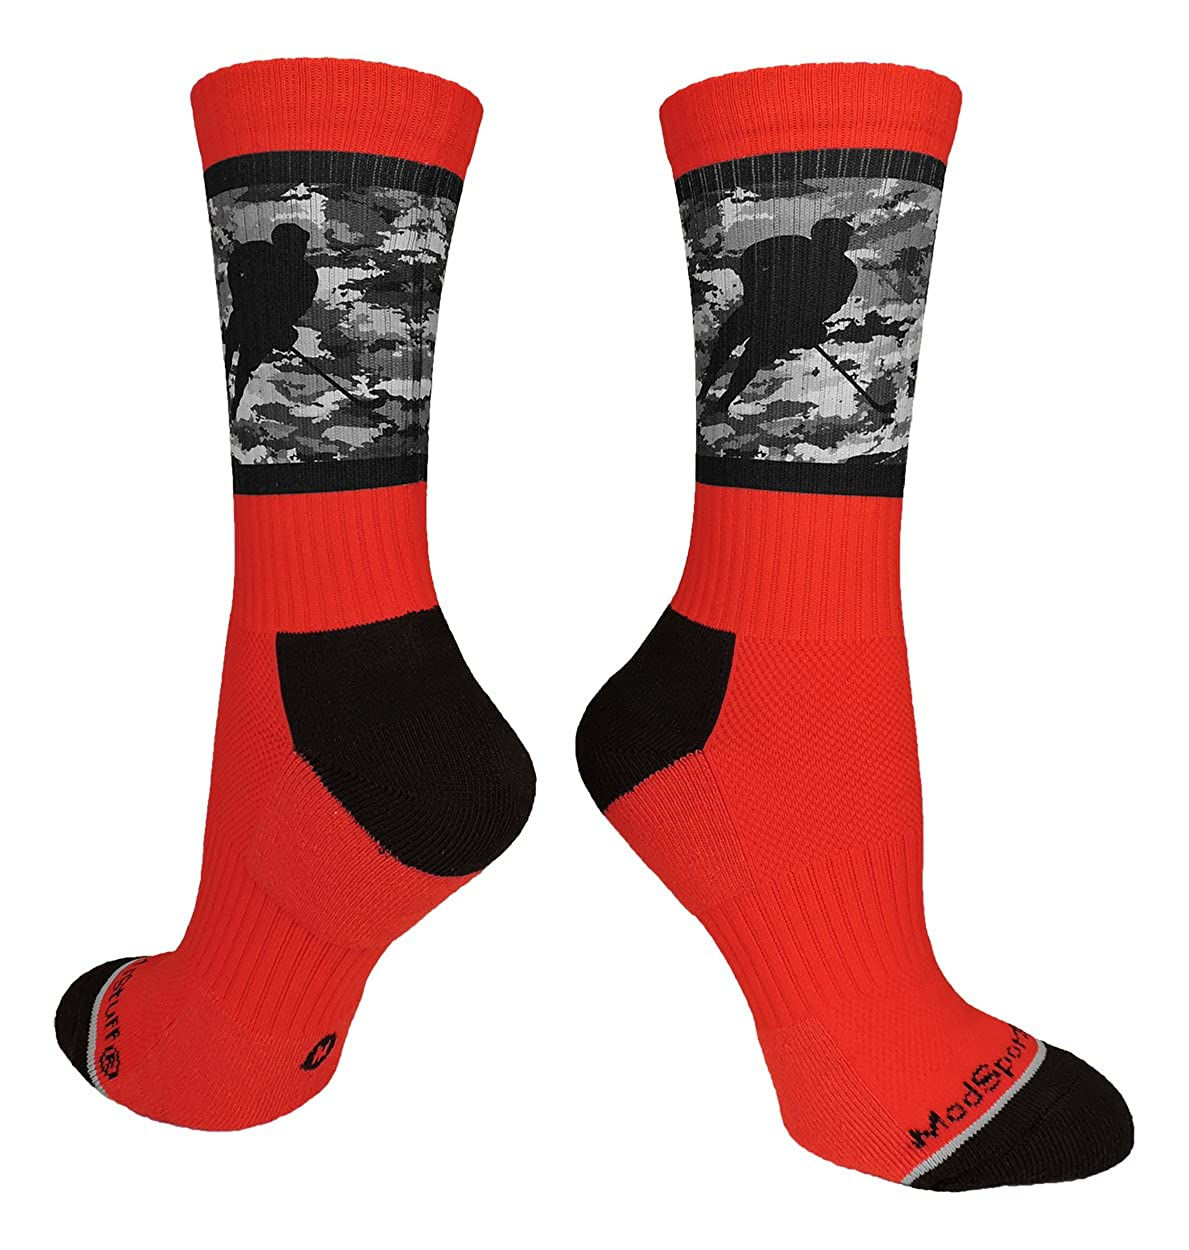 Hockey Player Athletic Crew Socks (multiple colors)